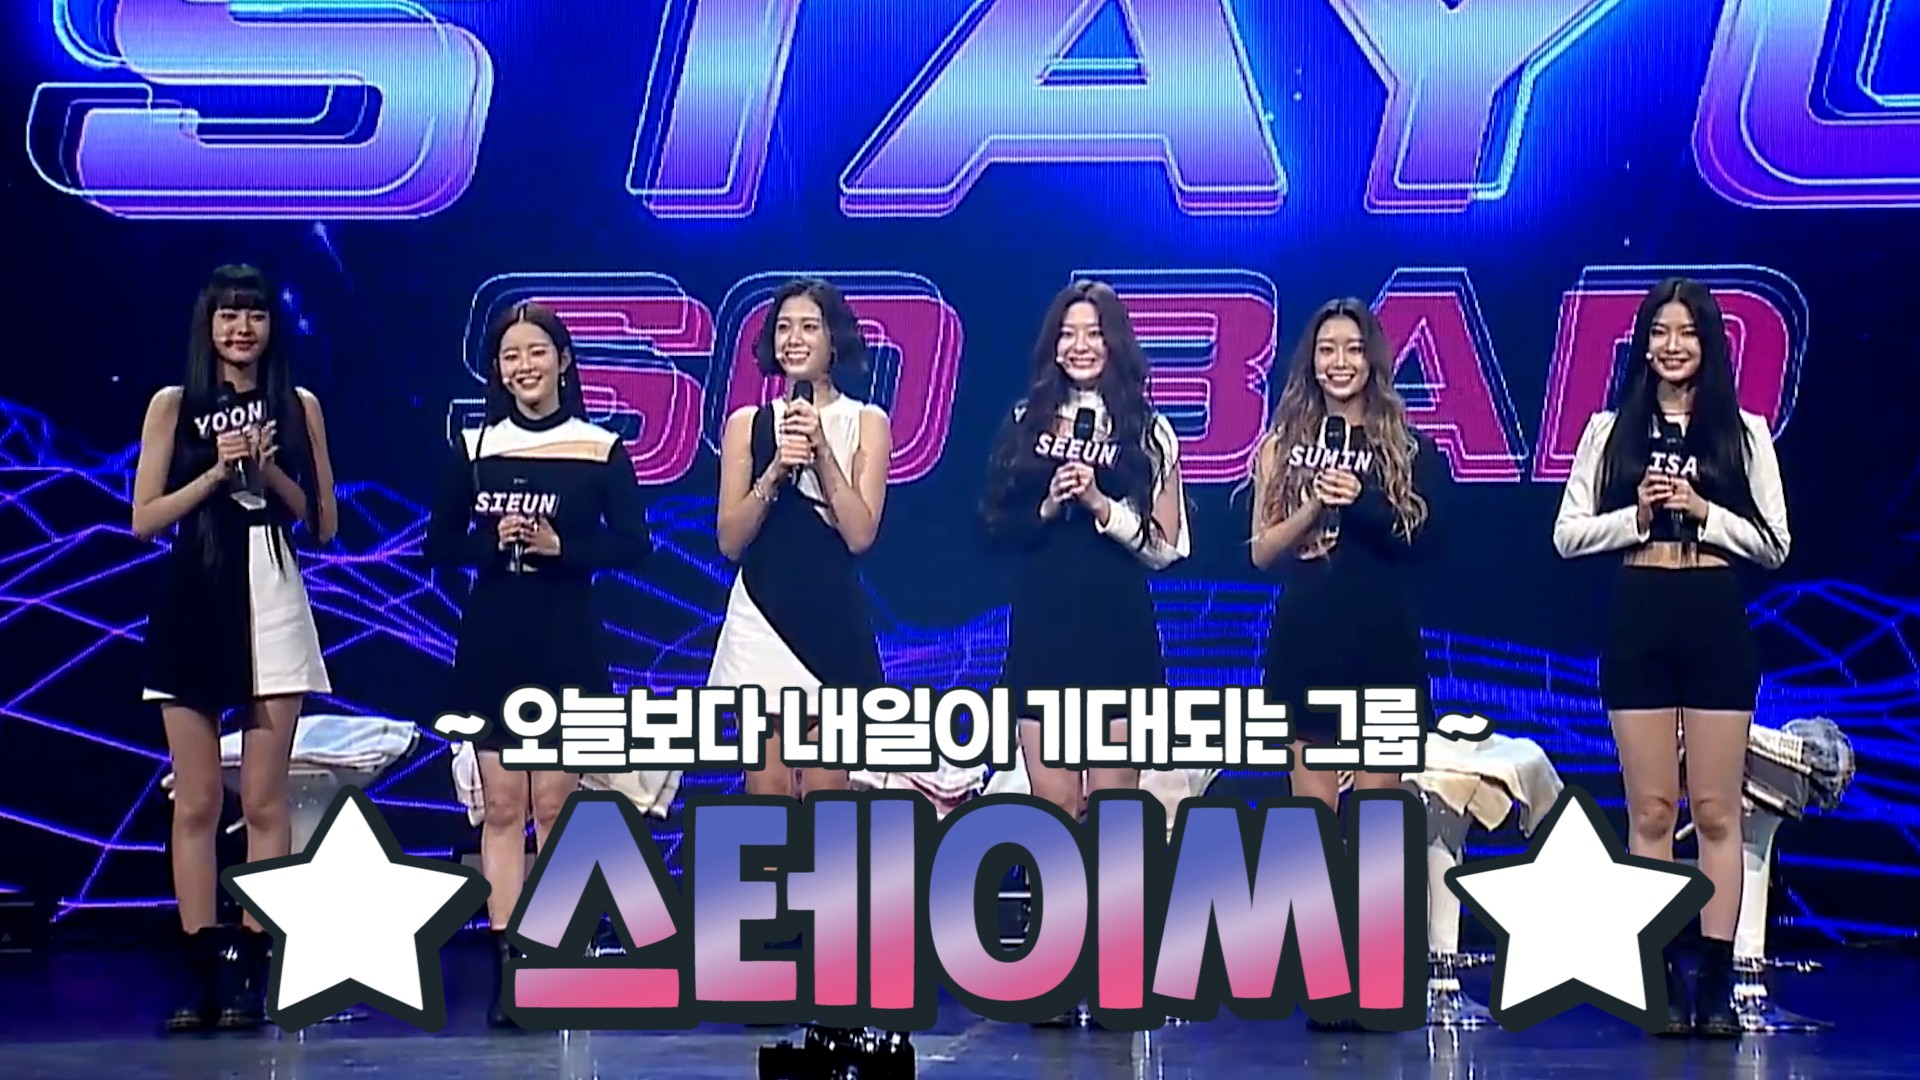 [STAYC] 장래희망📝 : 장수 아이돌 스테이씨의 최고령 장수 팬💕 (STAYC's Debut Showcase)